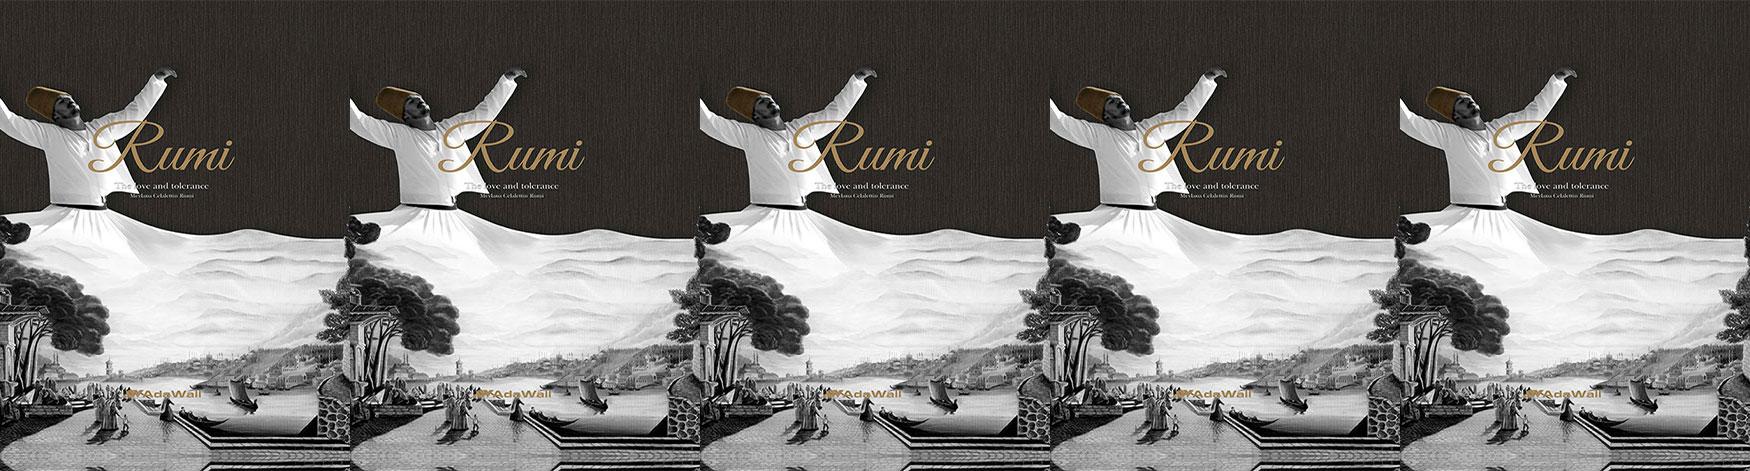 Tapet lavabil vinilic Rumi